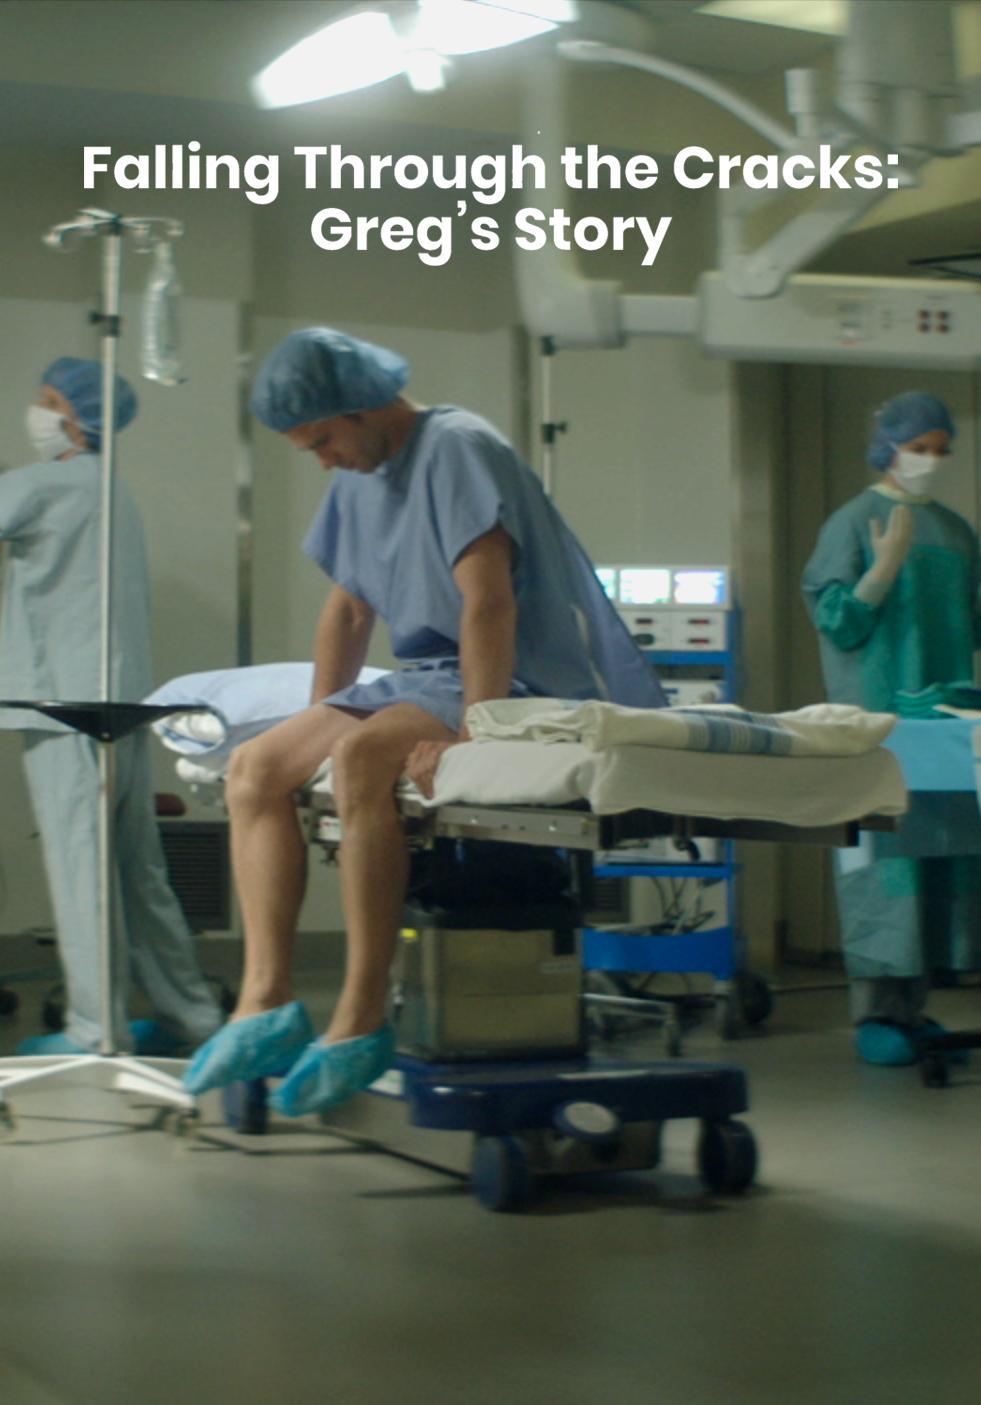 Falling Through the Cracks: Greg's Story 2018